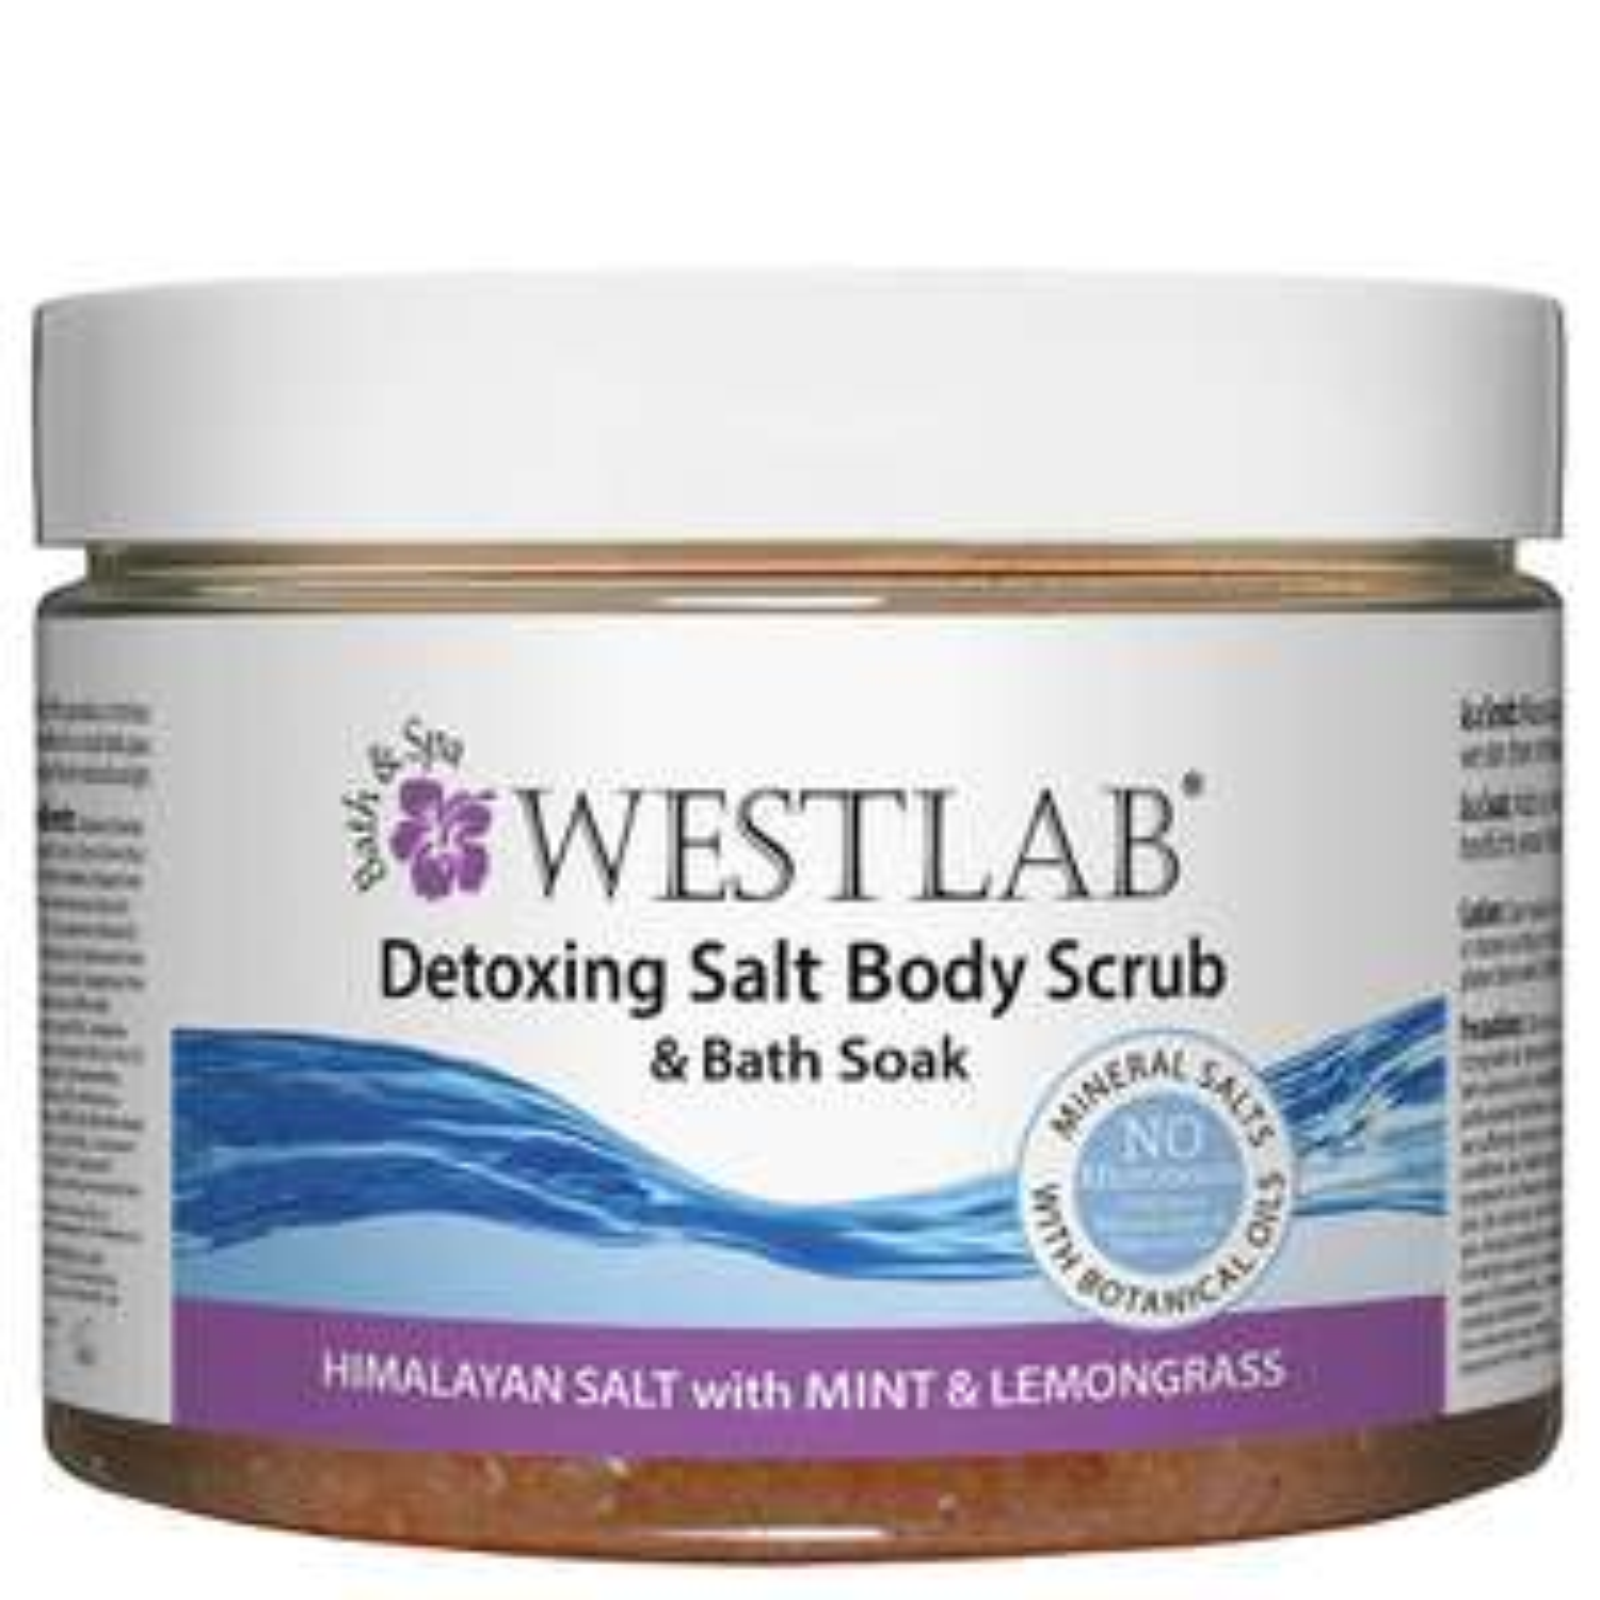 Westlab Detoxing Salt Body Scrub - £2.99 at Home Bargains